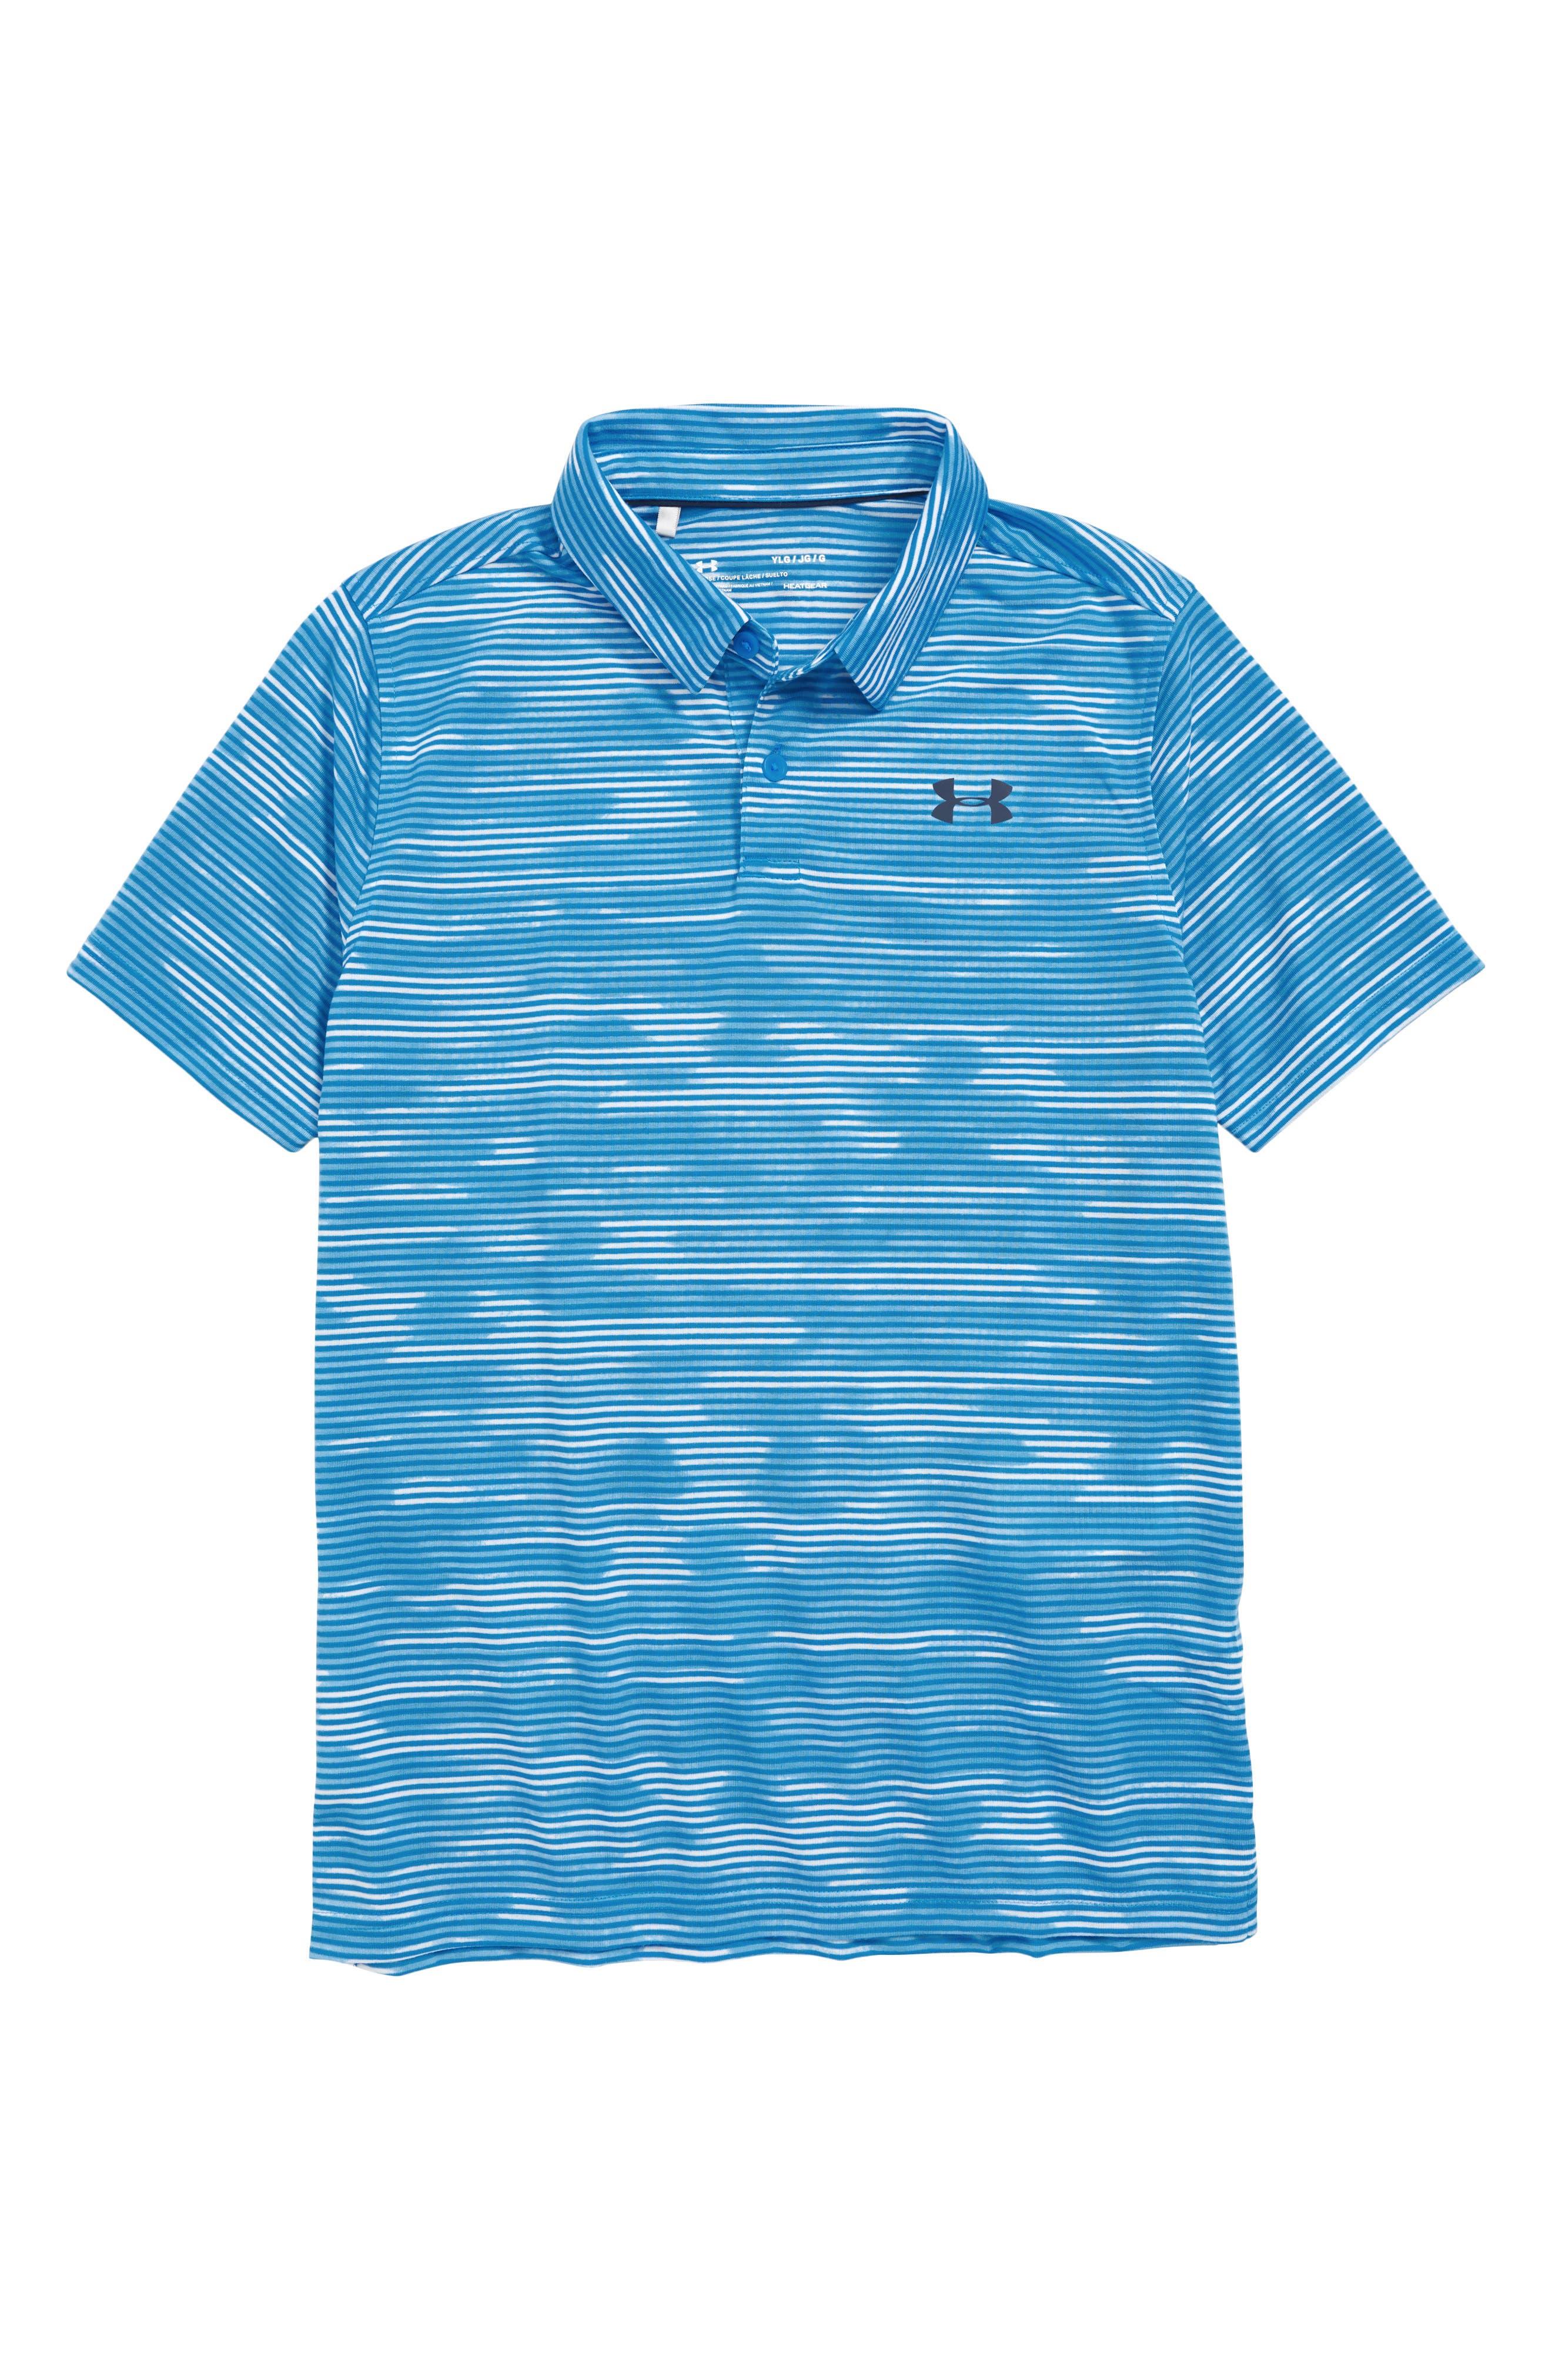 Threadborne Polo,                         Main,                         color, BLUE CIRCUIT